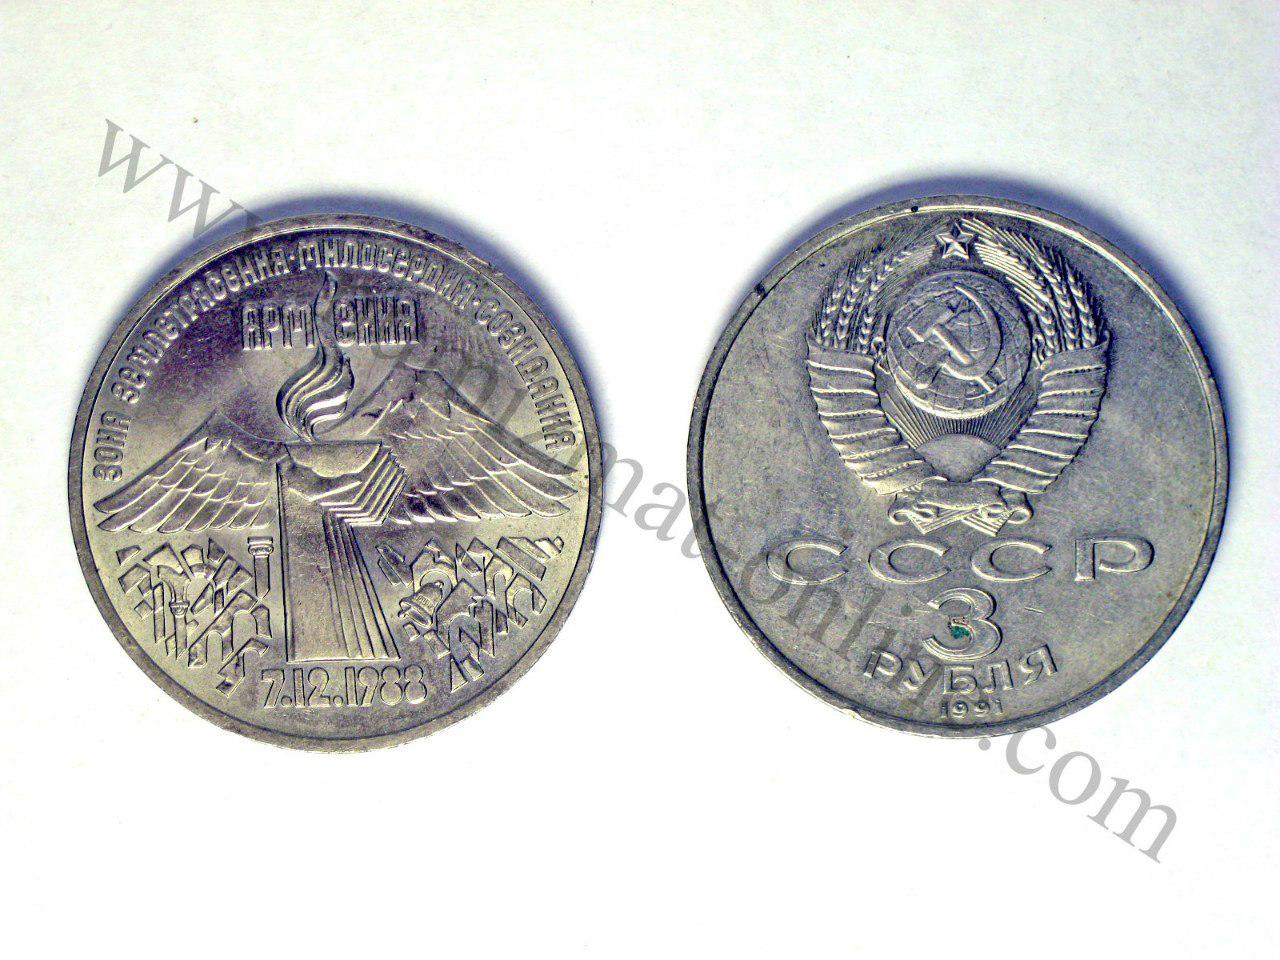 1989 (3 рубля) Годовщина землятресения в Армении